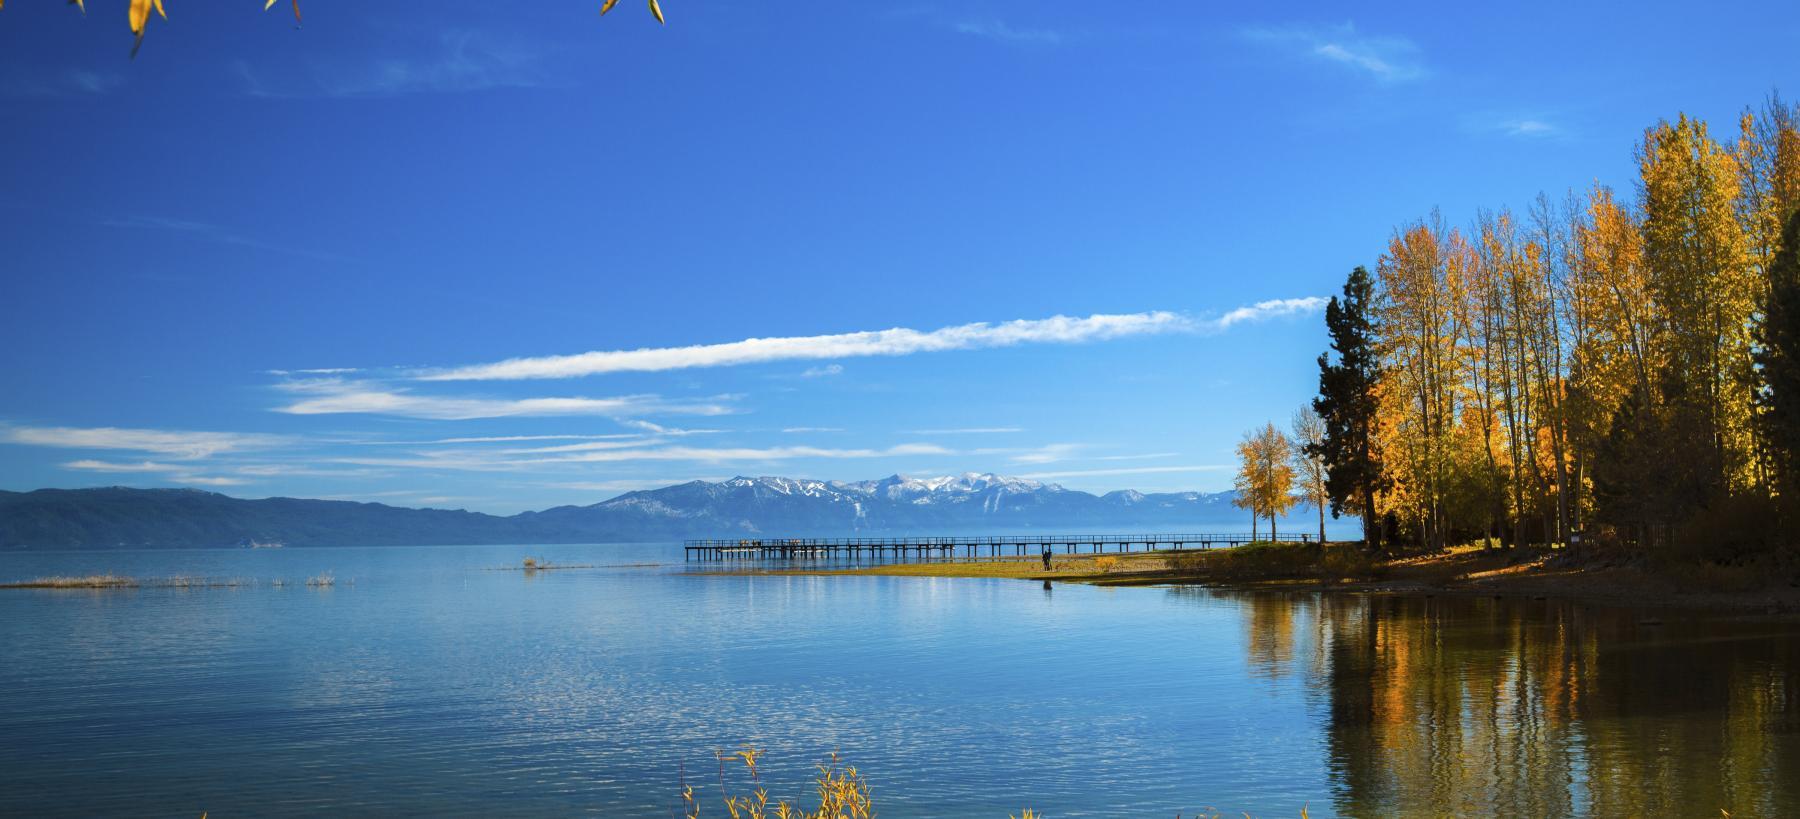 Tahoe Rental Company Lake Tahoe Cabins Amp Ski Lease